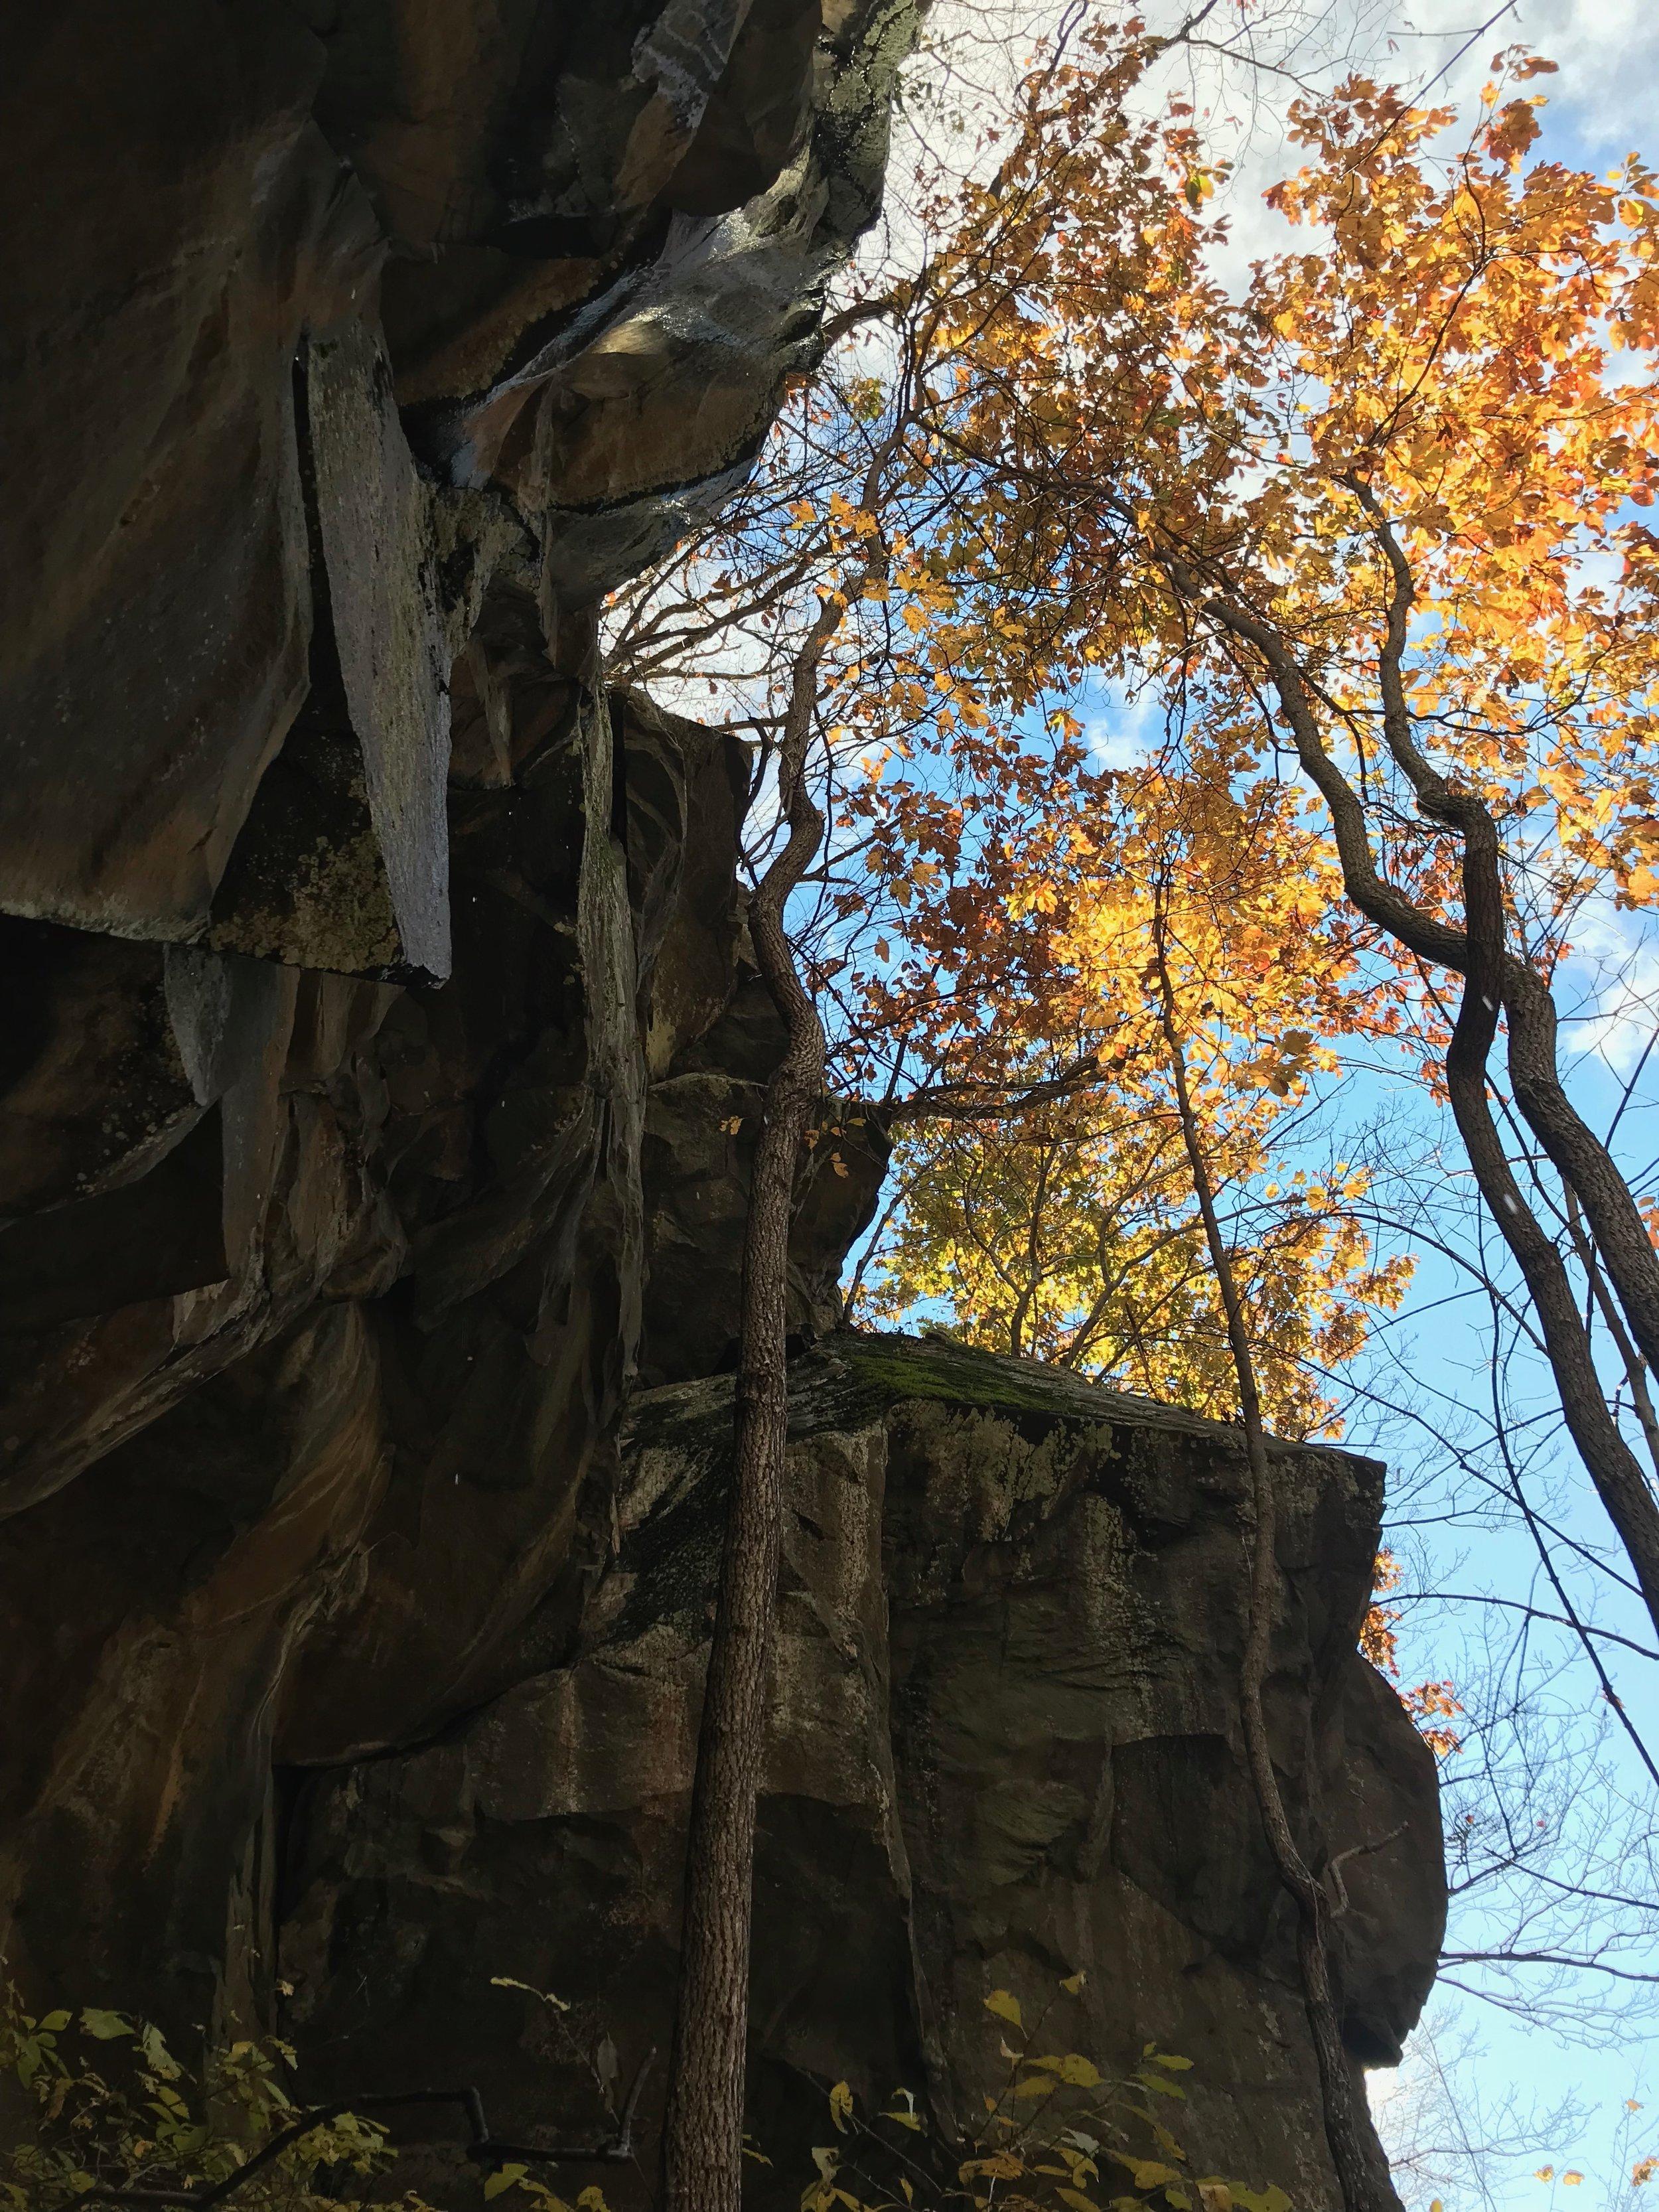 Shenandoah National Park in autumn… DO IT!